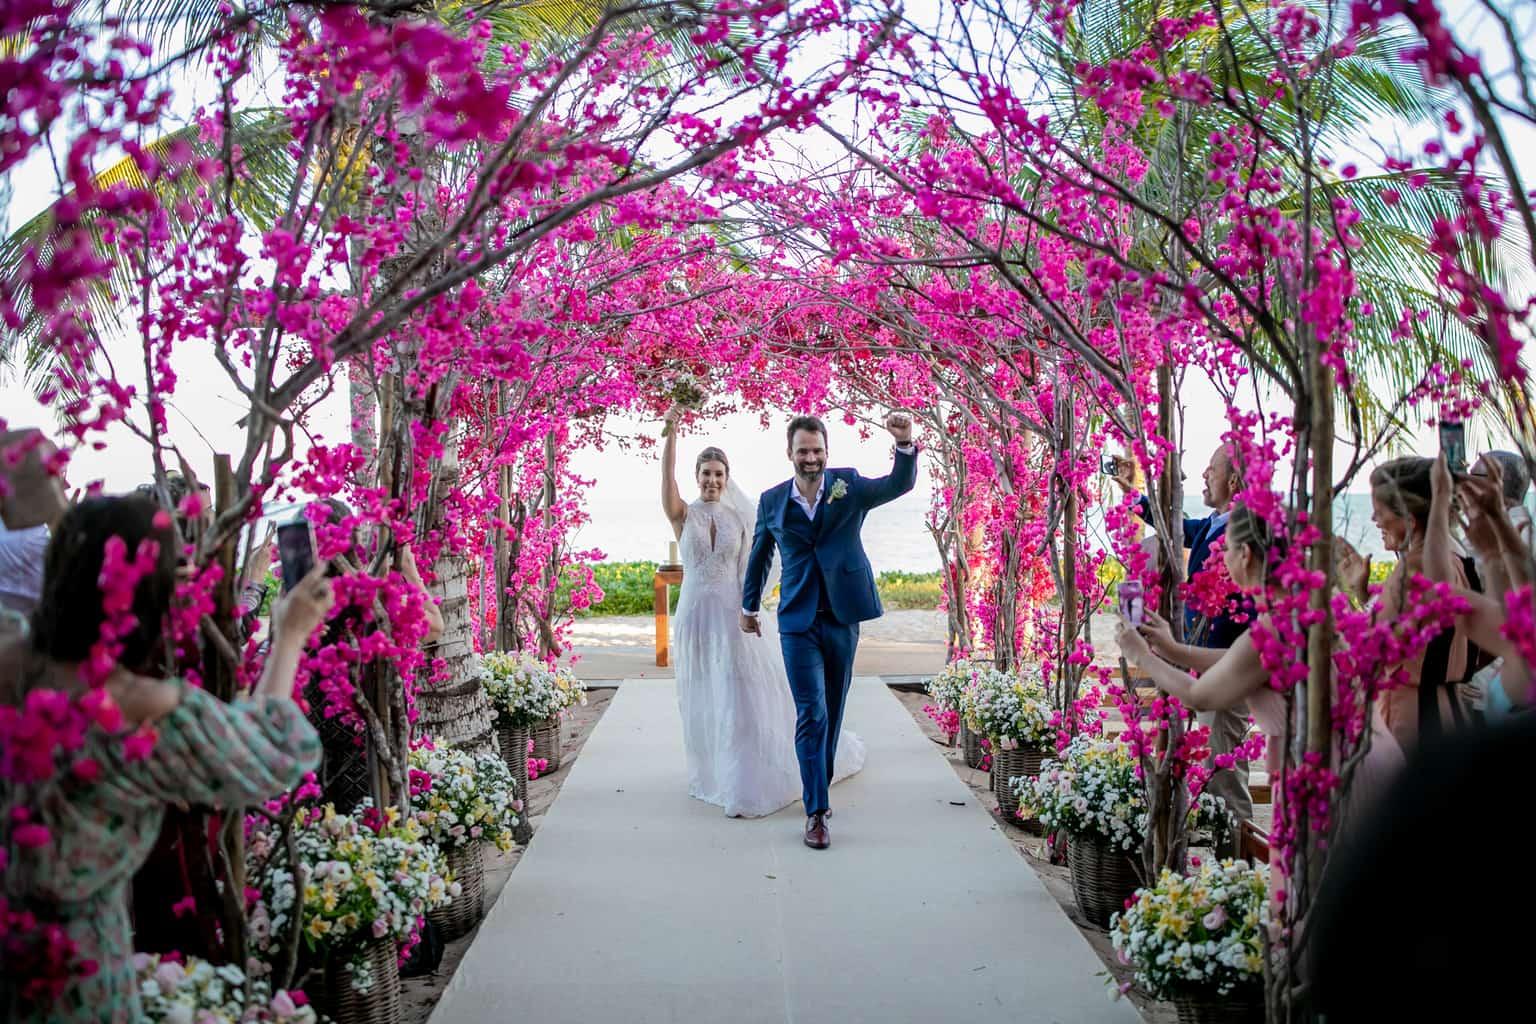 casamento-Taina-e-Hugo-Itapororoca-Villa-Trancoso-Patricia-Galvao-Sotter-Fotografia-Cerimonia-na-praia755